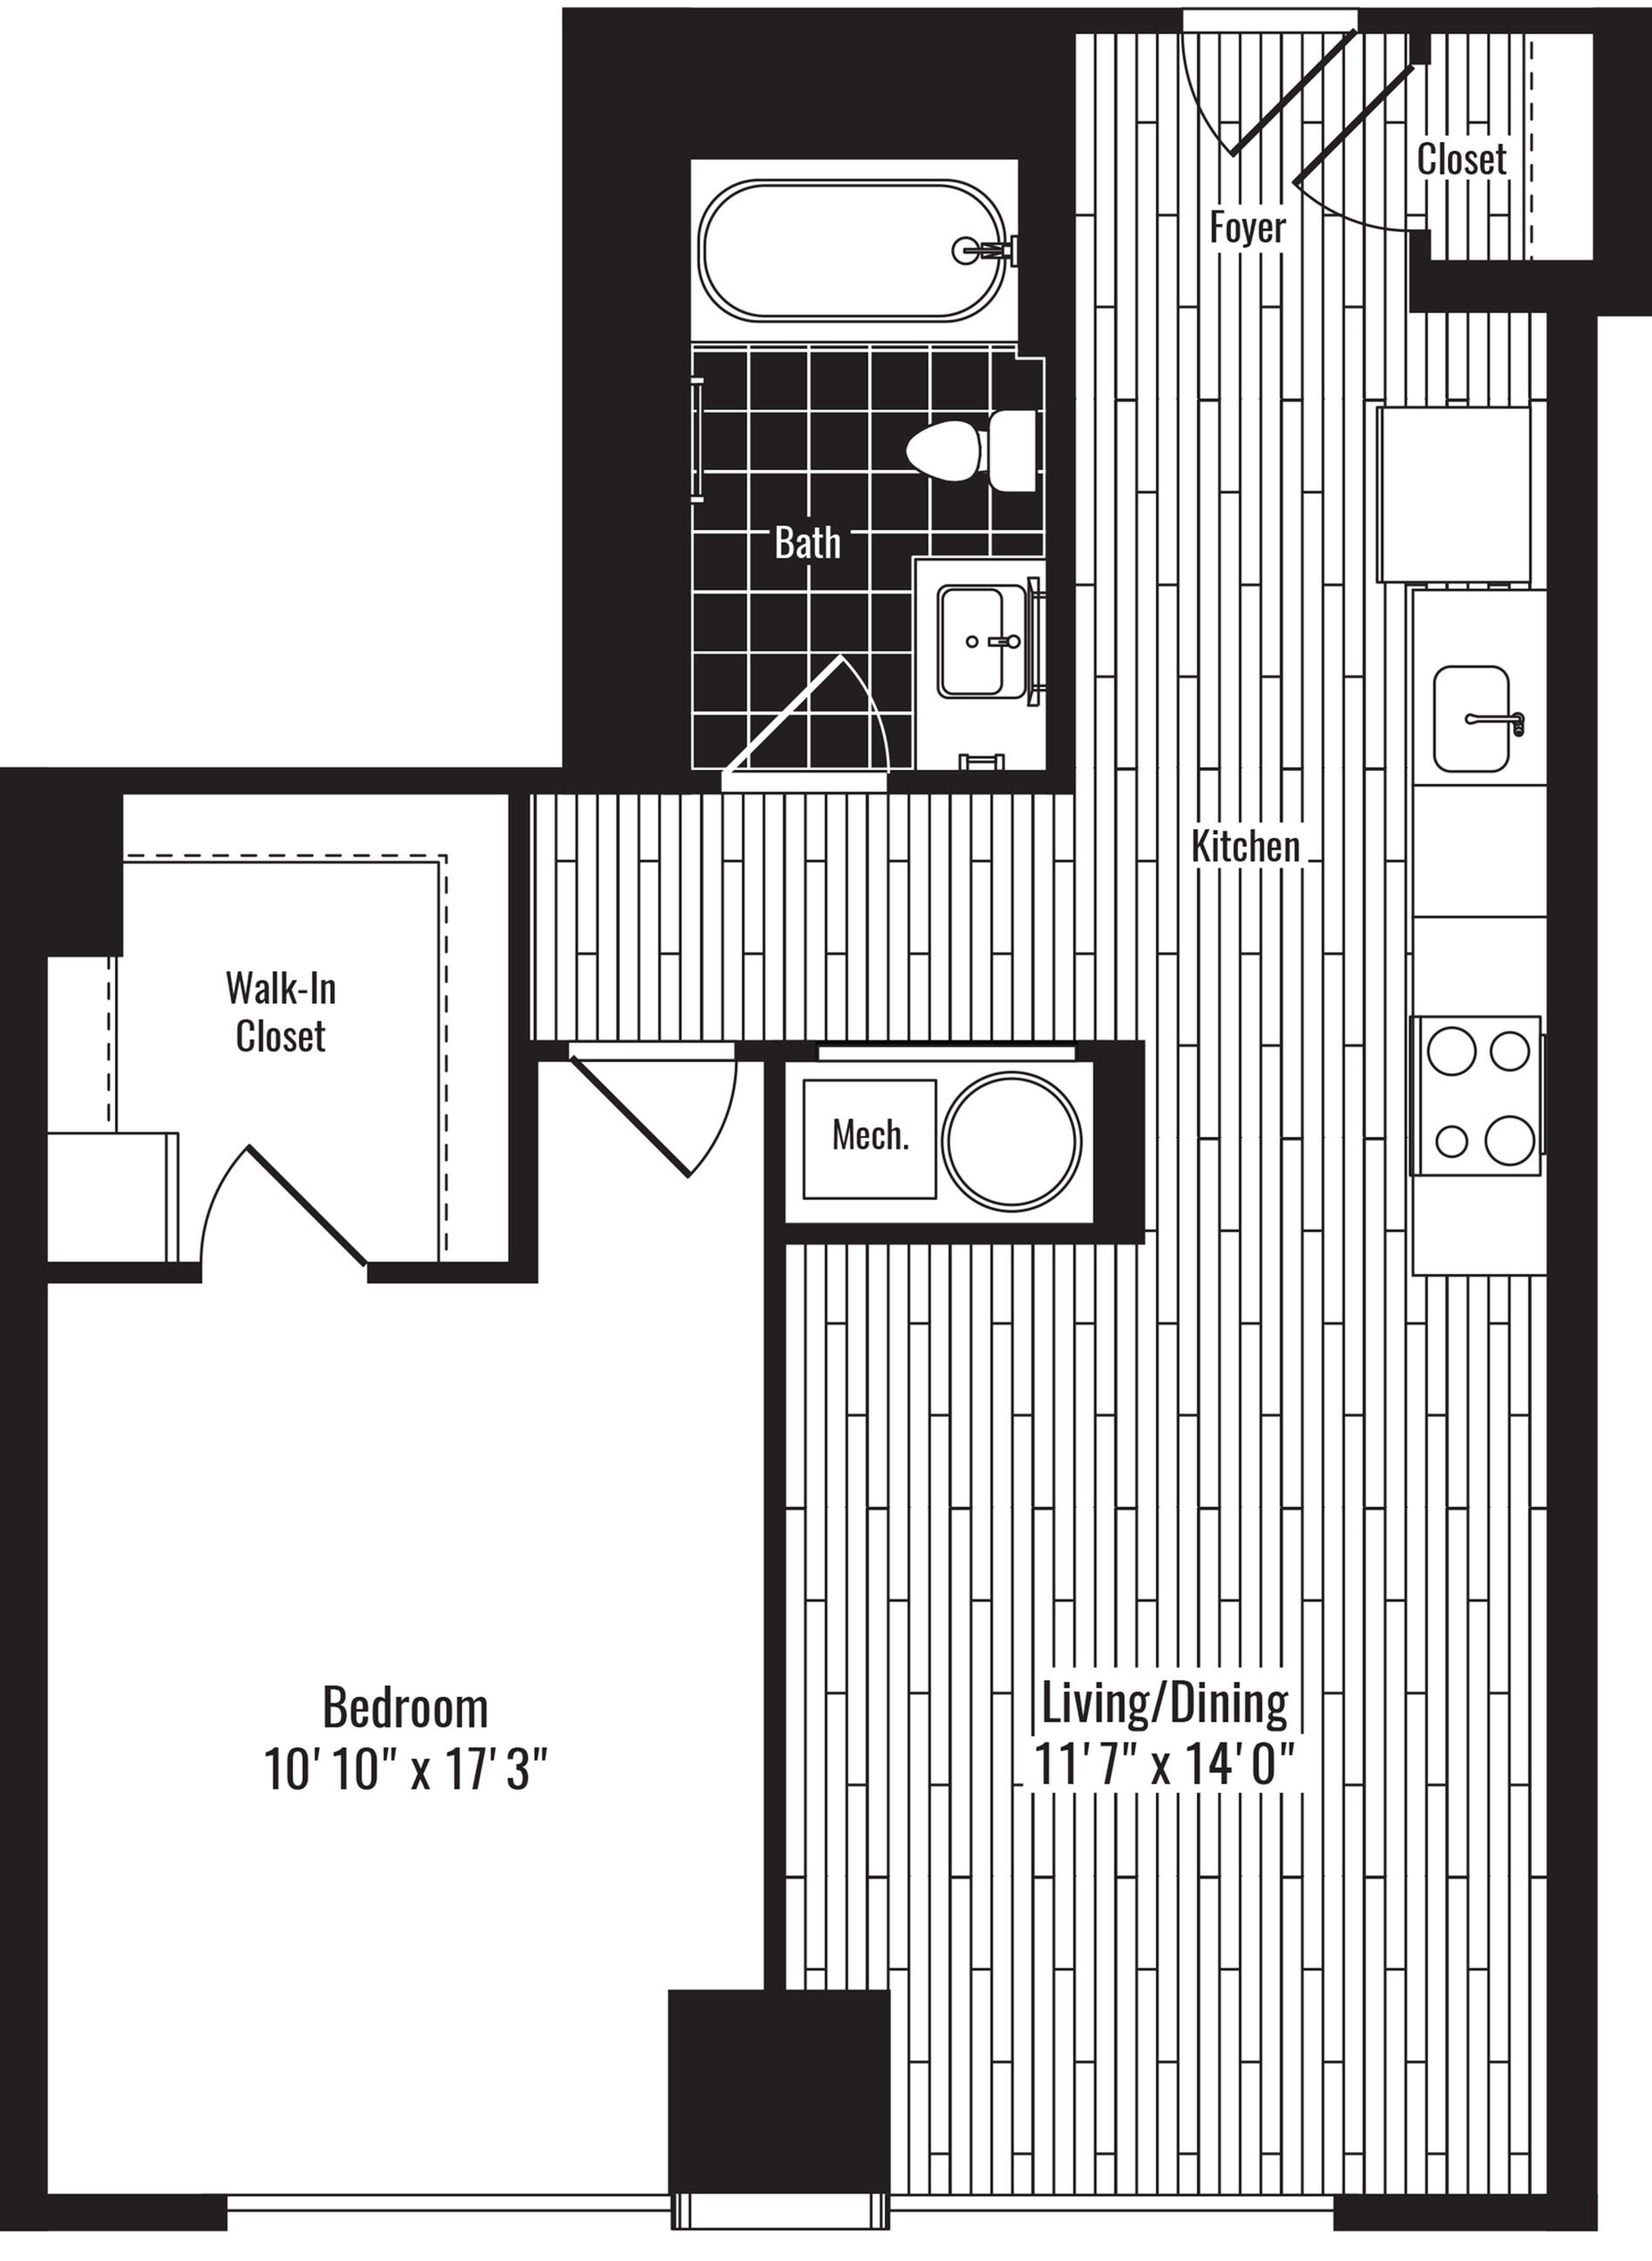 708 square foot one bedroom one bath apartment floorplan image